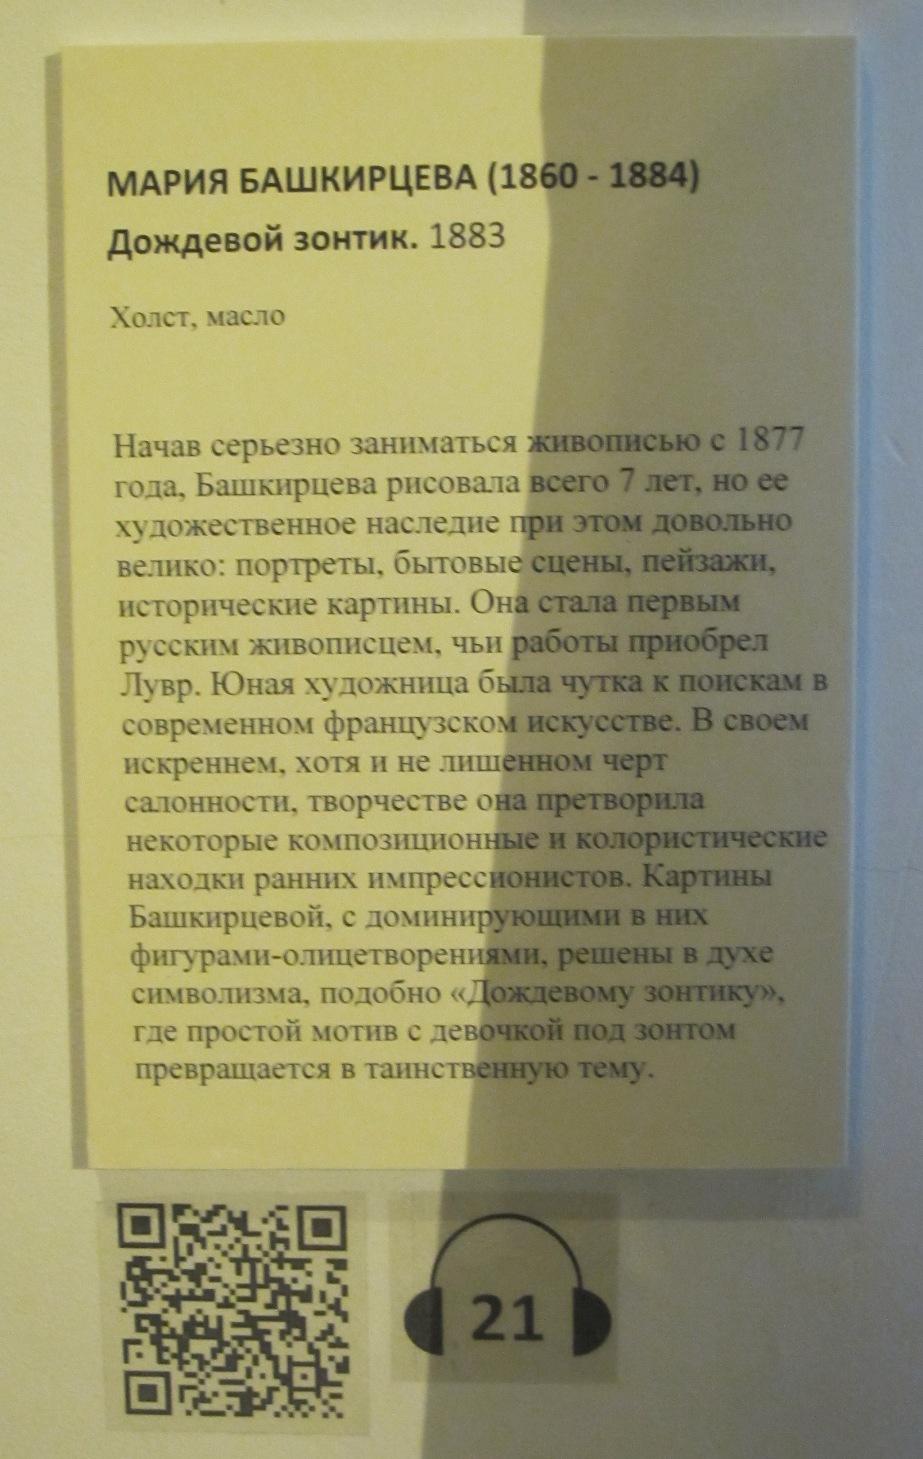 Художник Мария Башкирцева